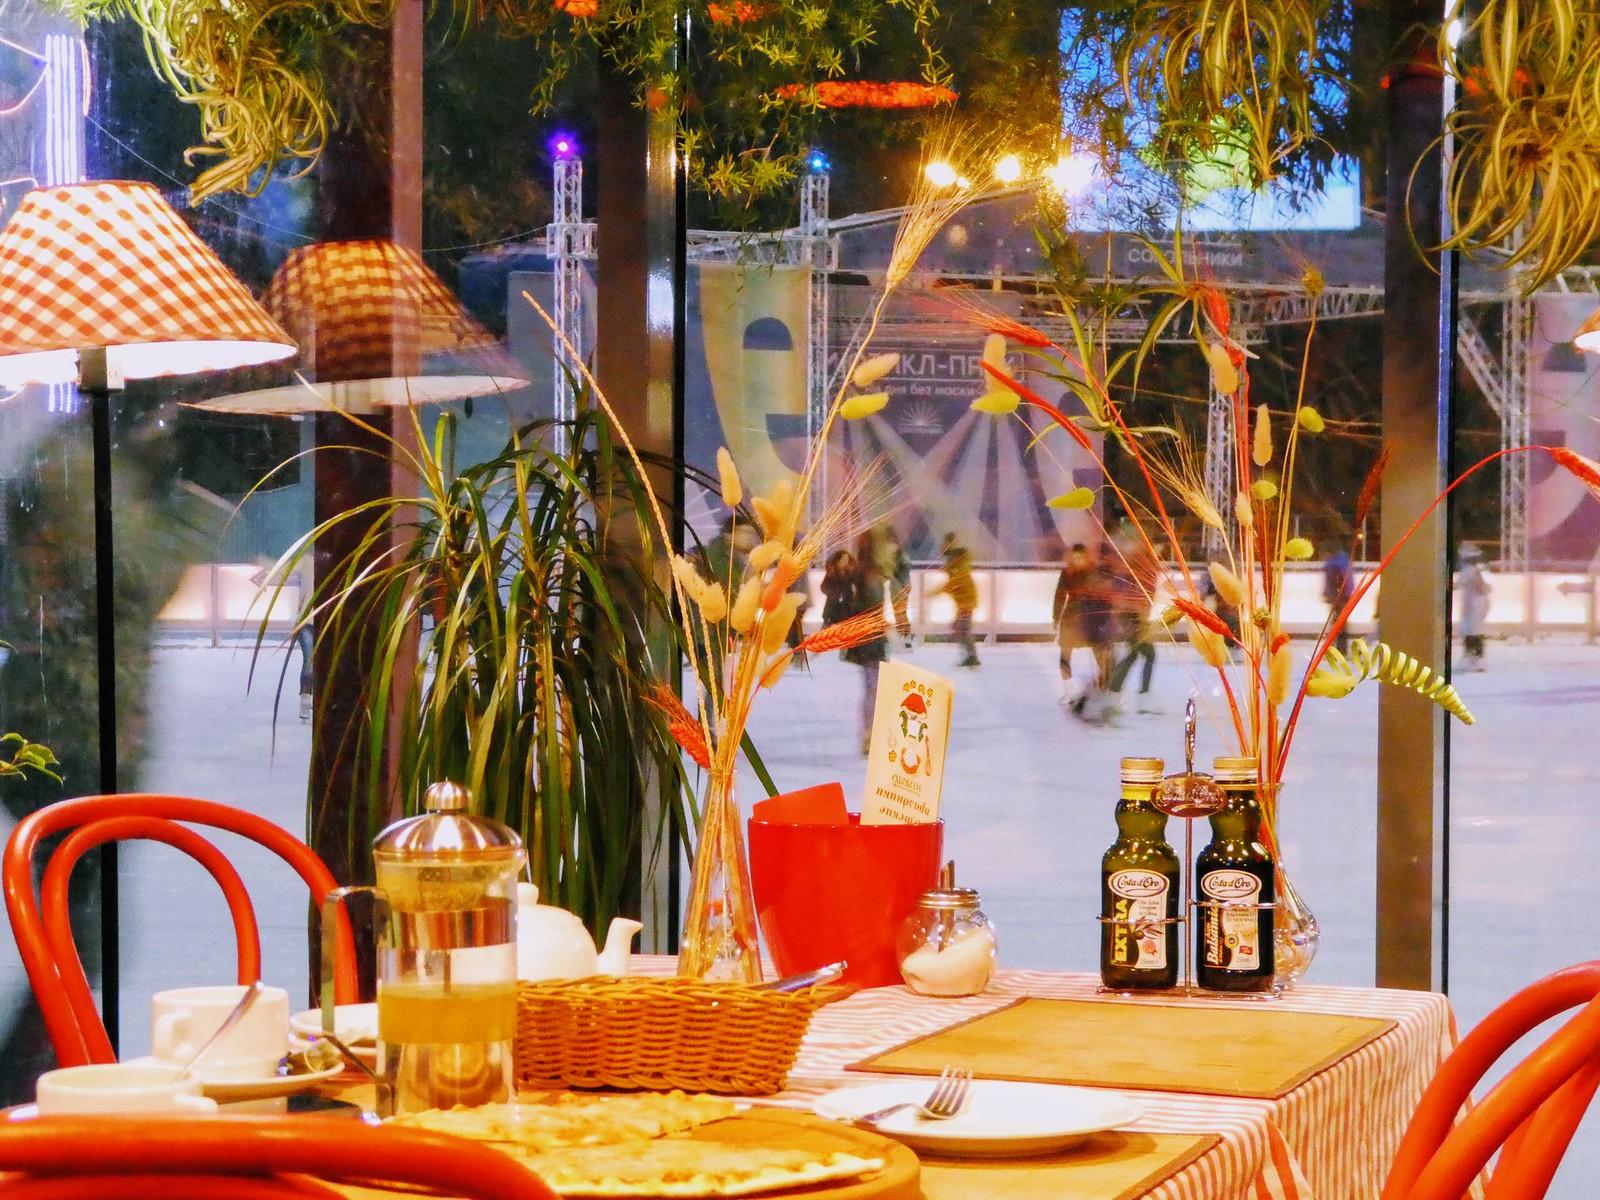 Merkato Italian Restaurant, Sokolniki Park Moscow